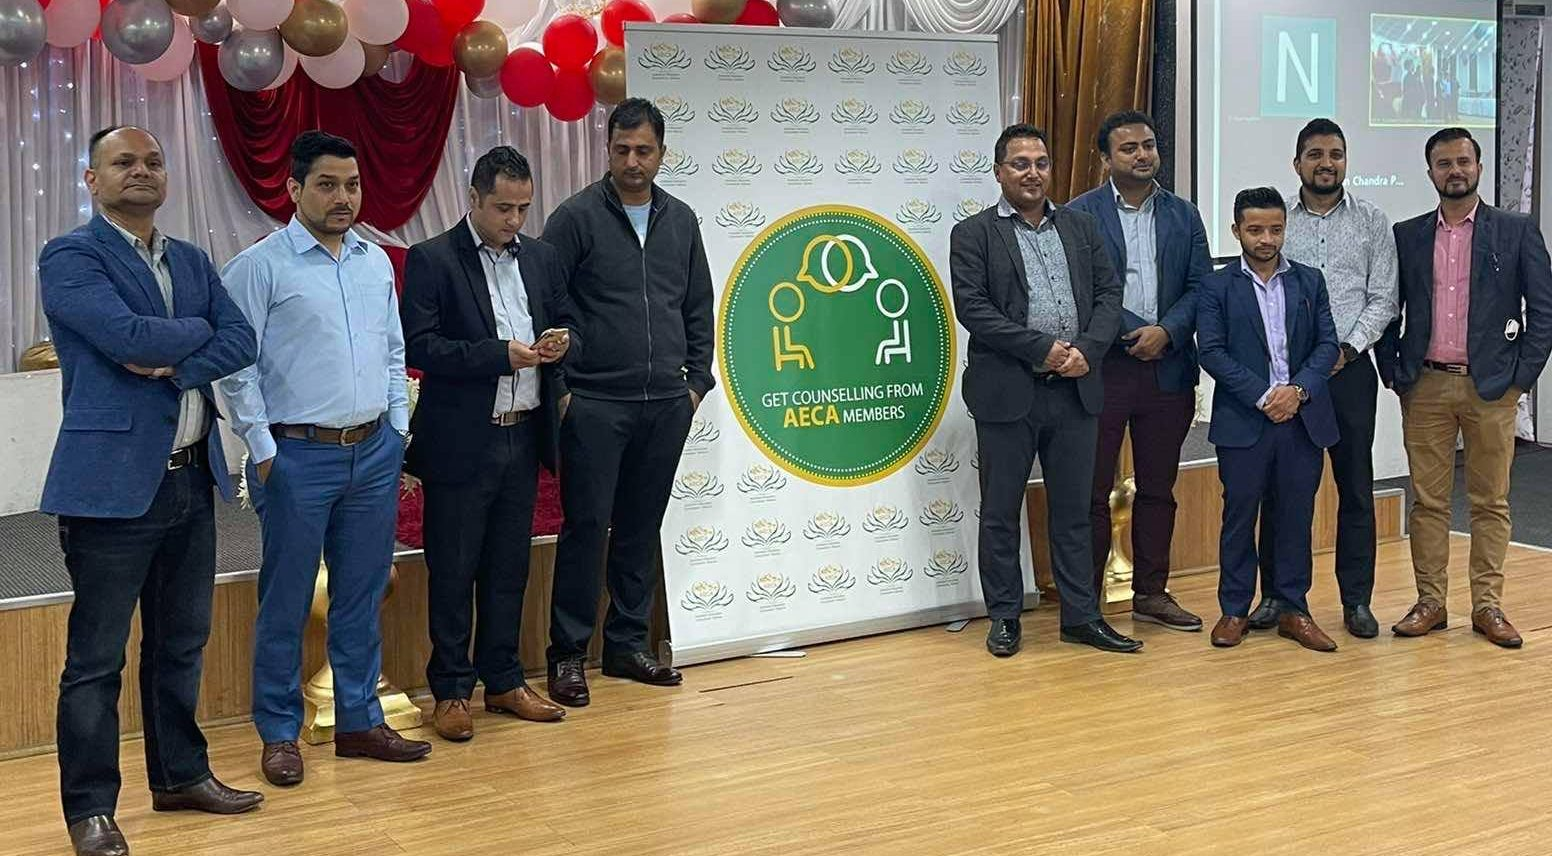 Bhupal Sitaula elected president of Australian Education Consultants' Alliance (AECA)